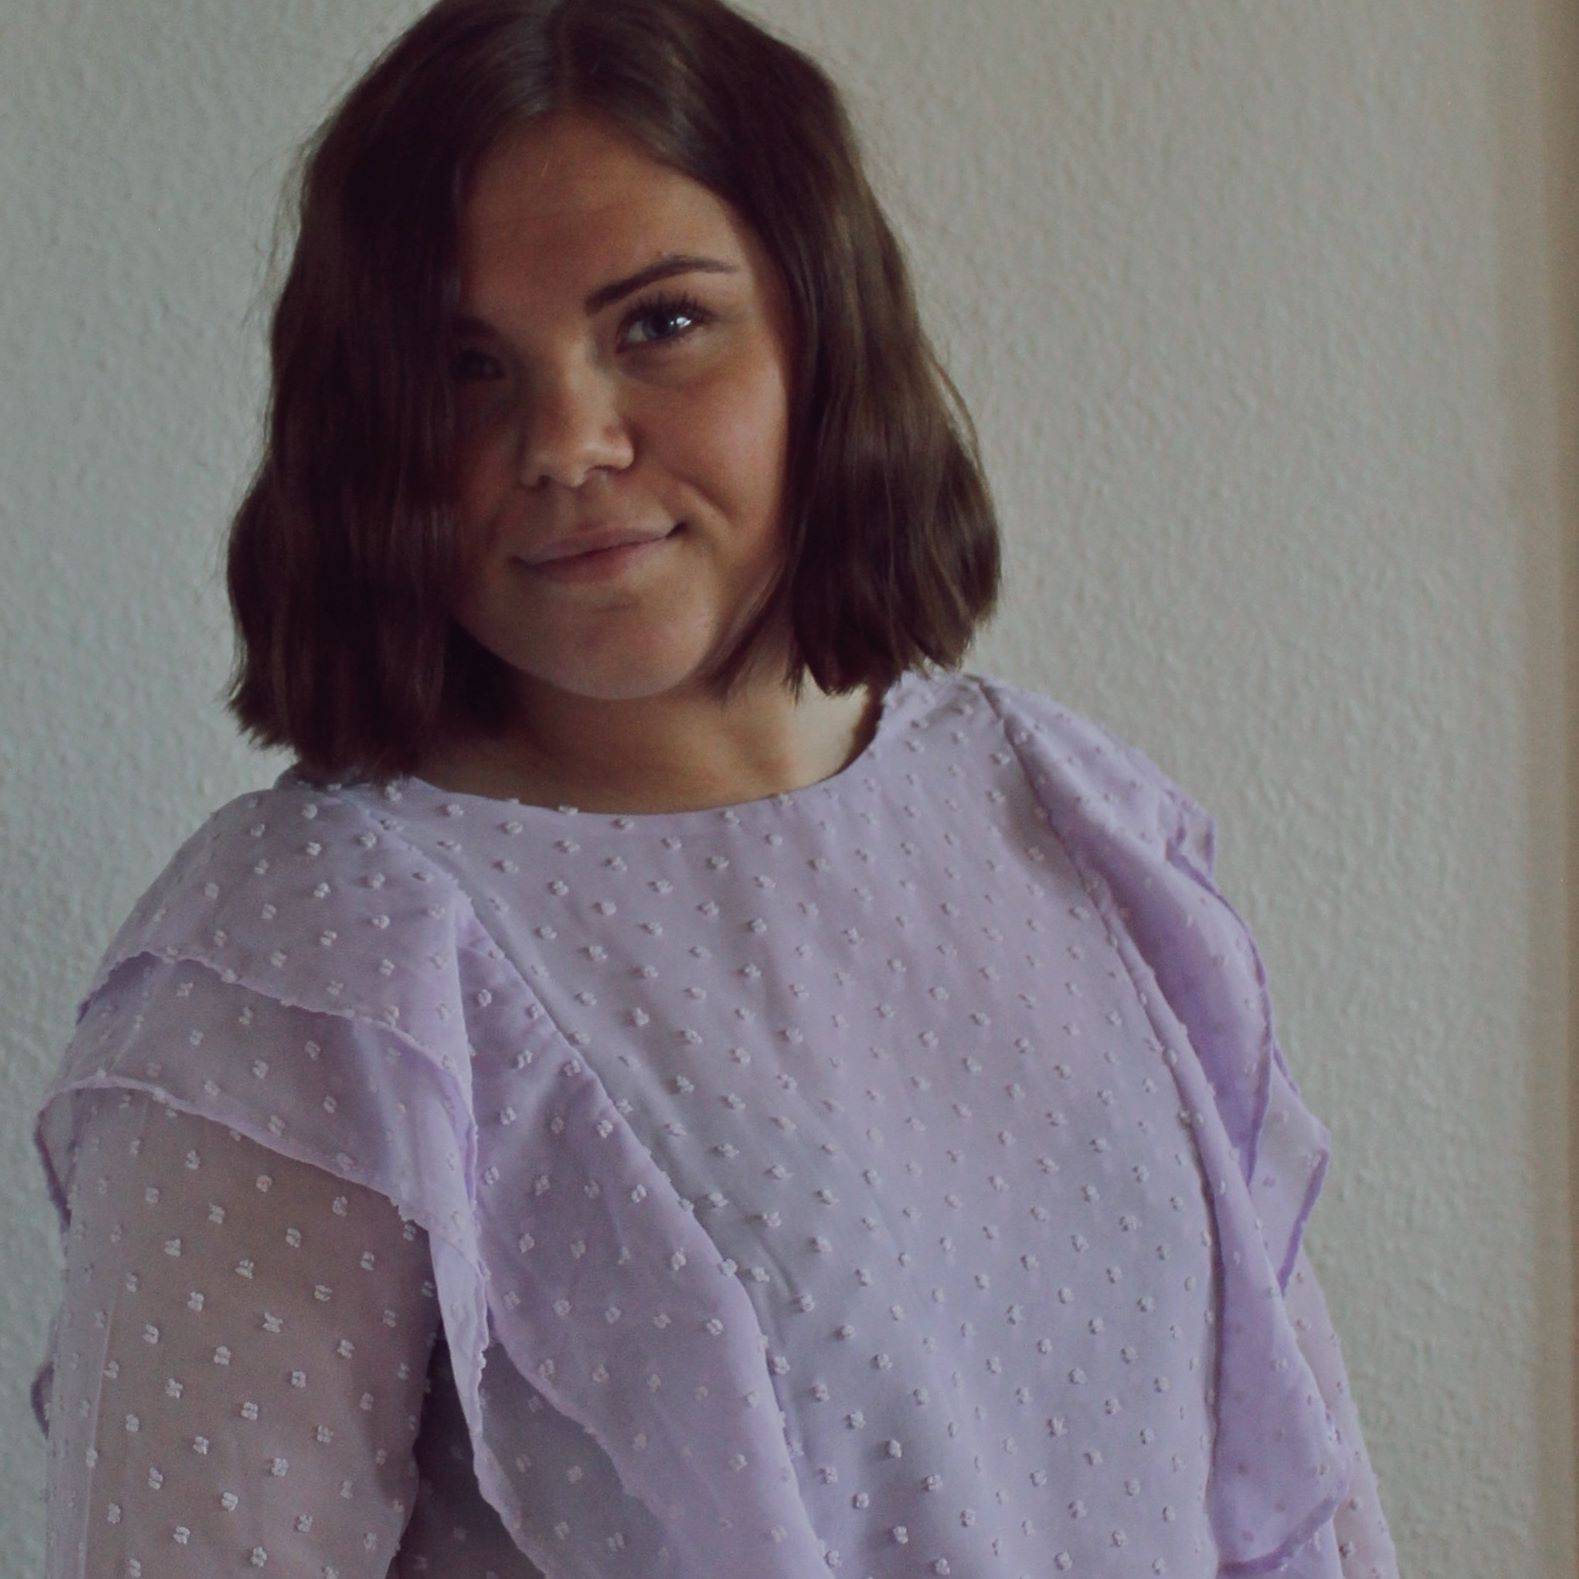 Kristina Kjergaard